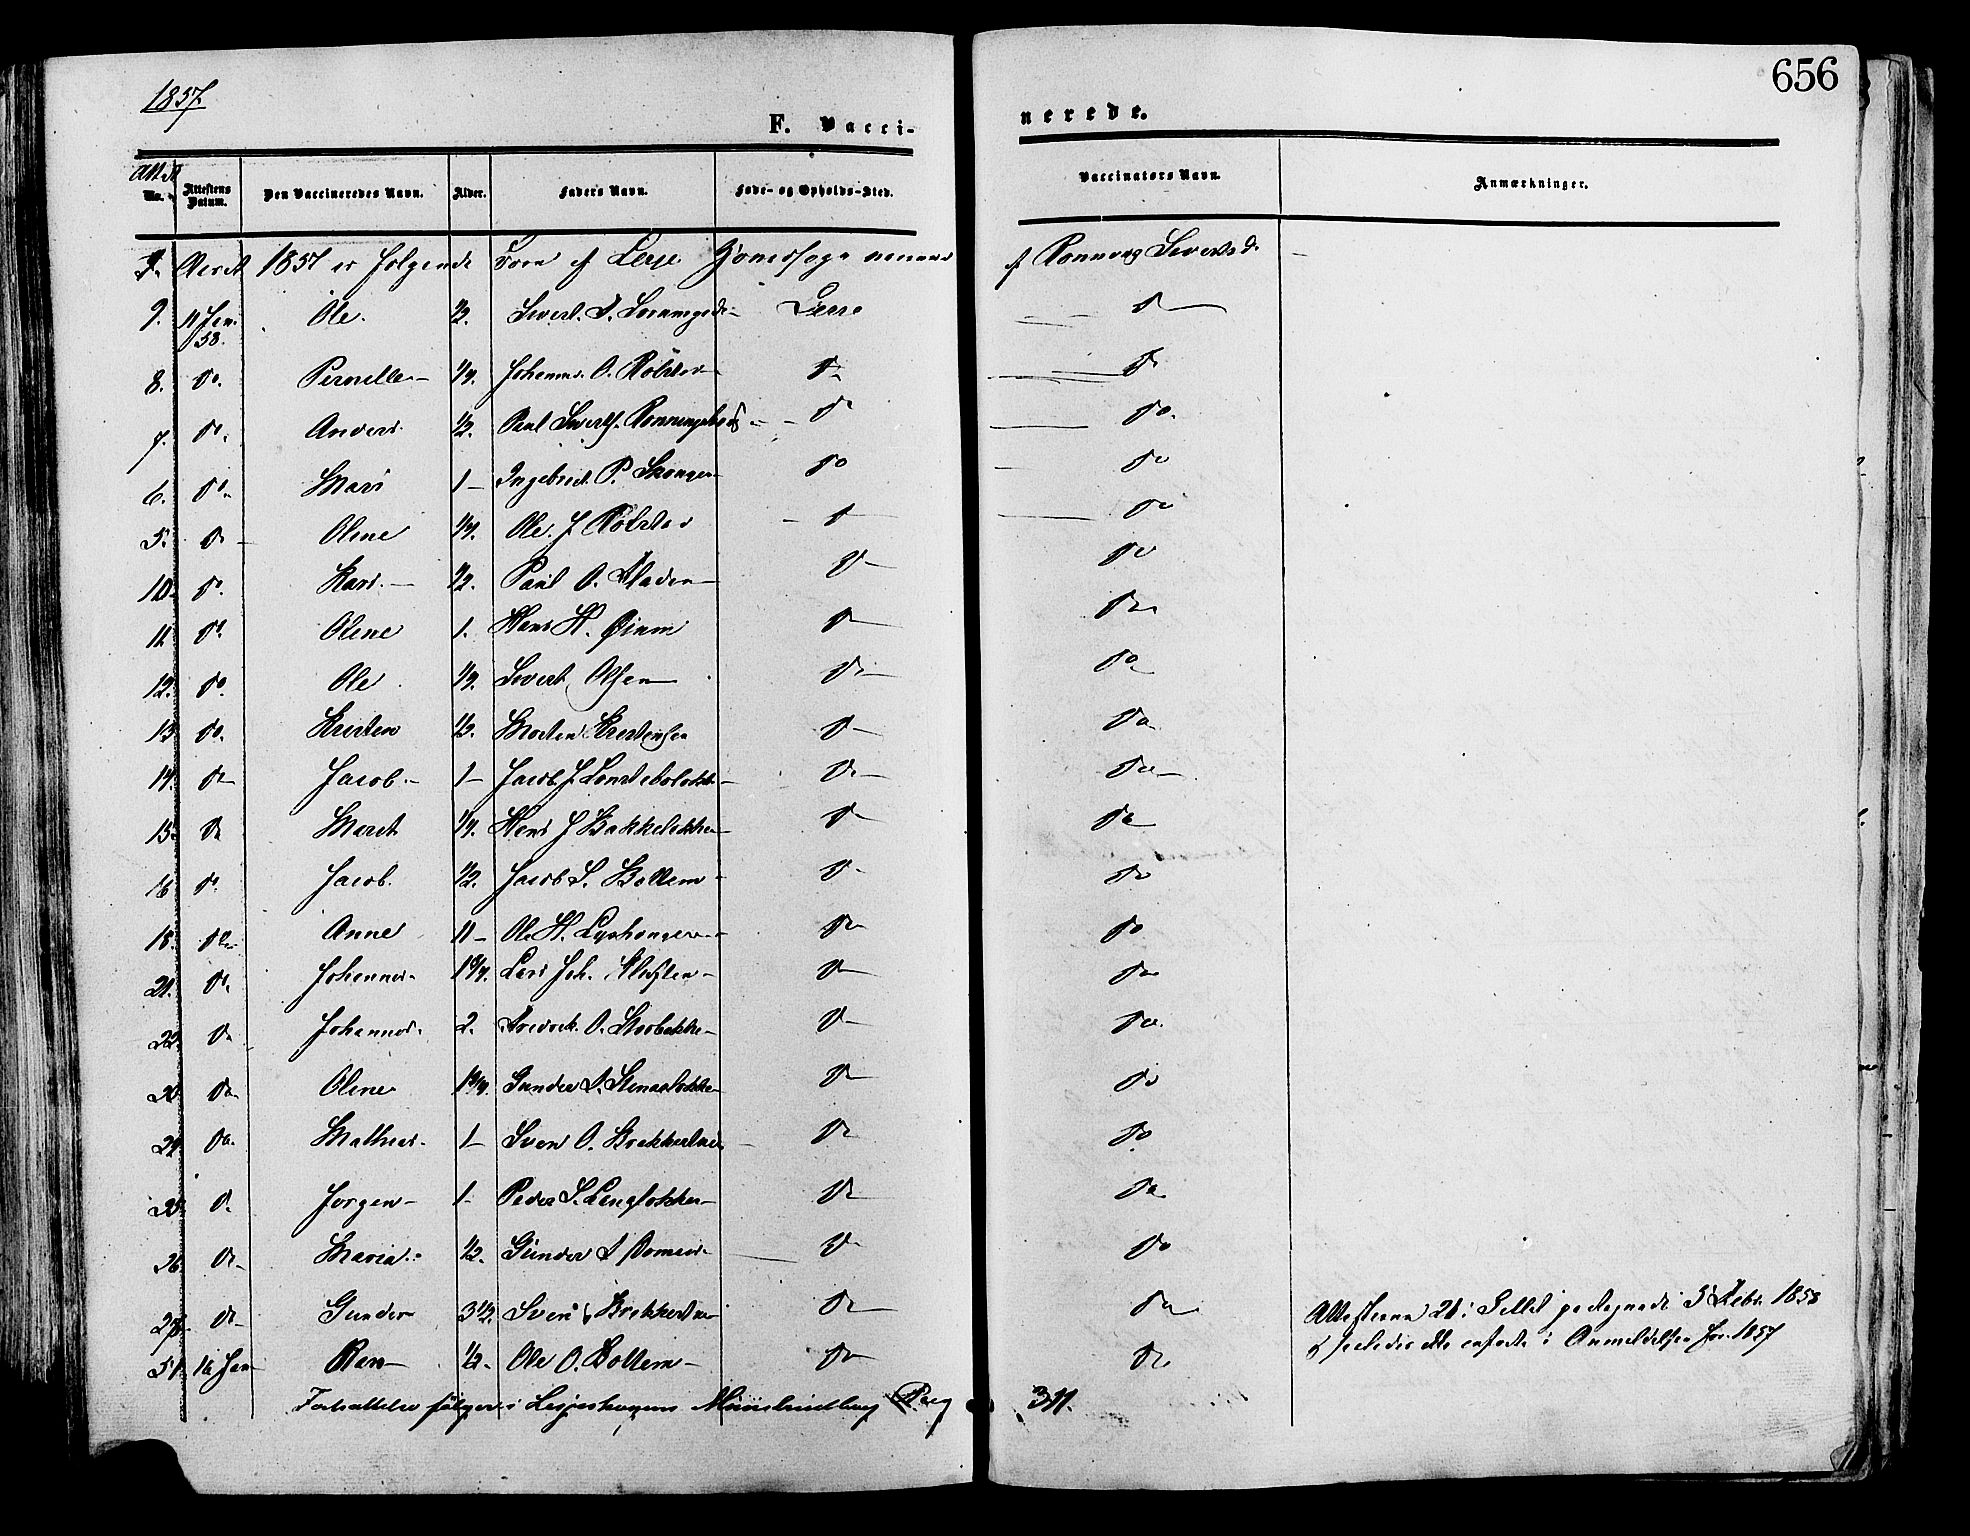 SAH, Lesja prestekontor, Ministerialbok nr. 8, 1854-1880, s. 656